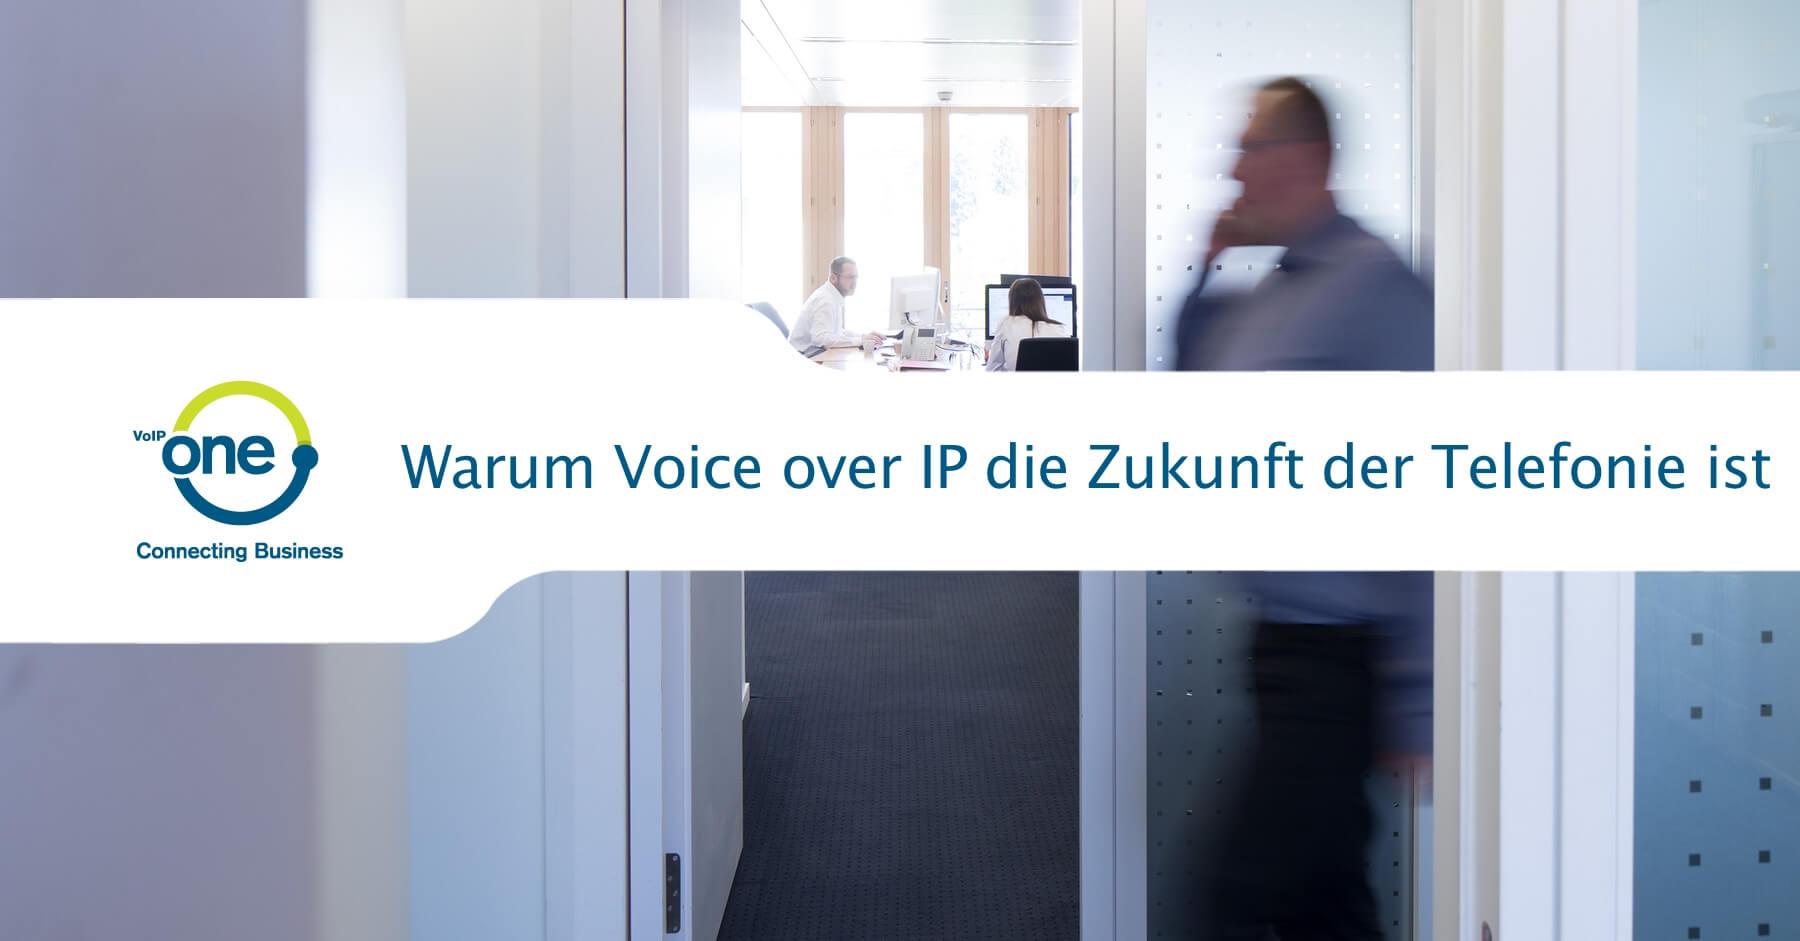 voice over ip die zukunft